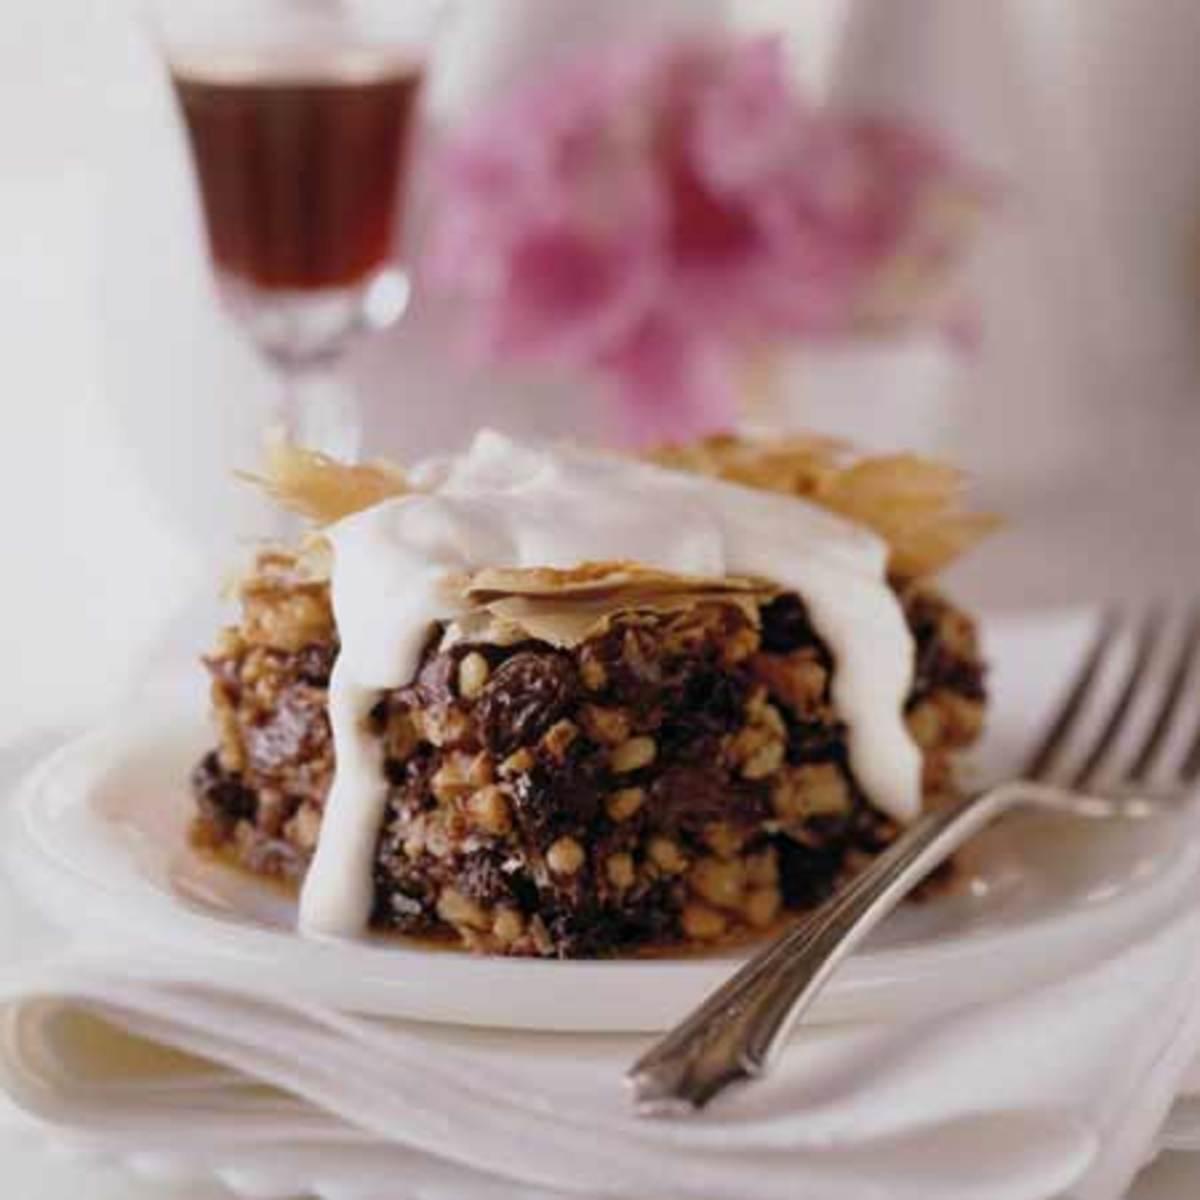 Chocolate Walnut-Raisin Baklava